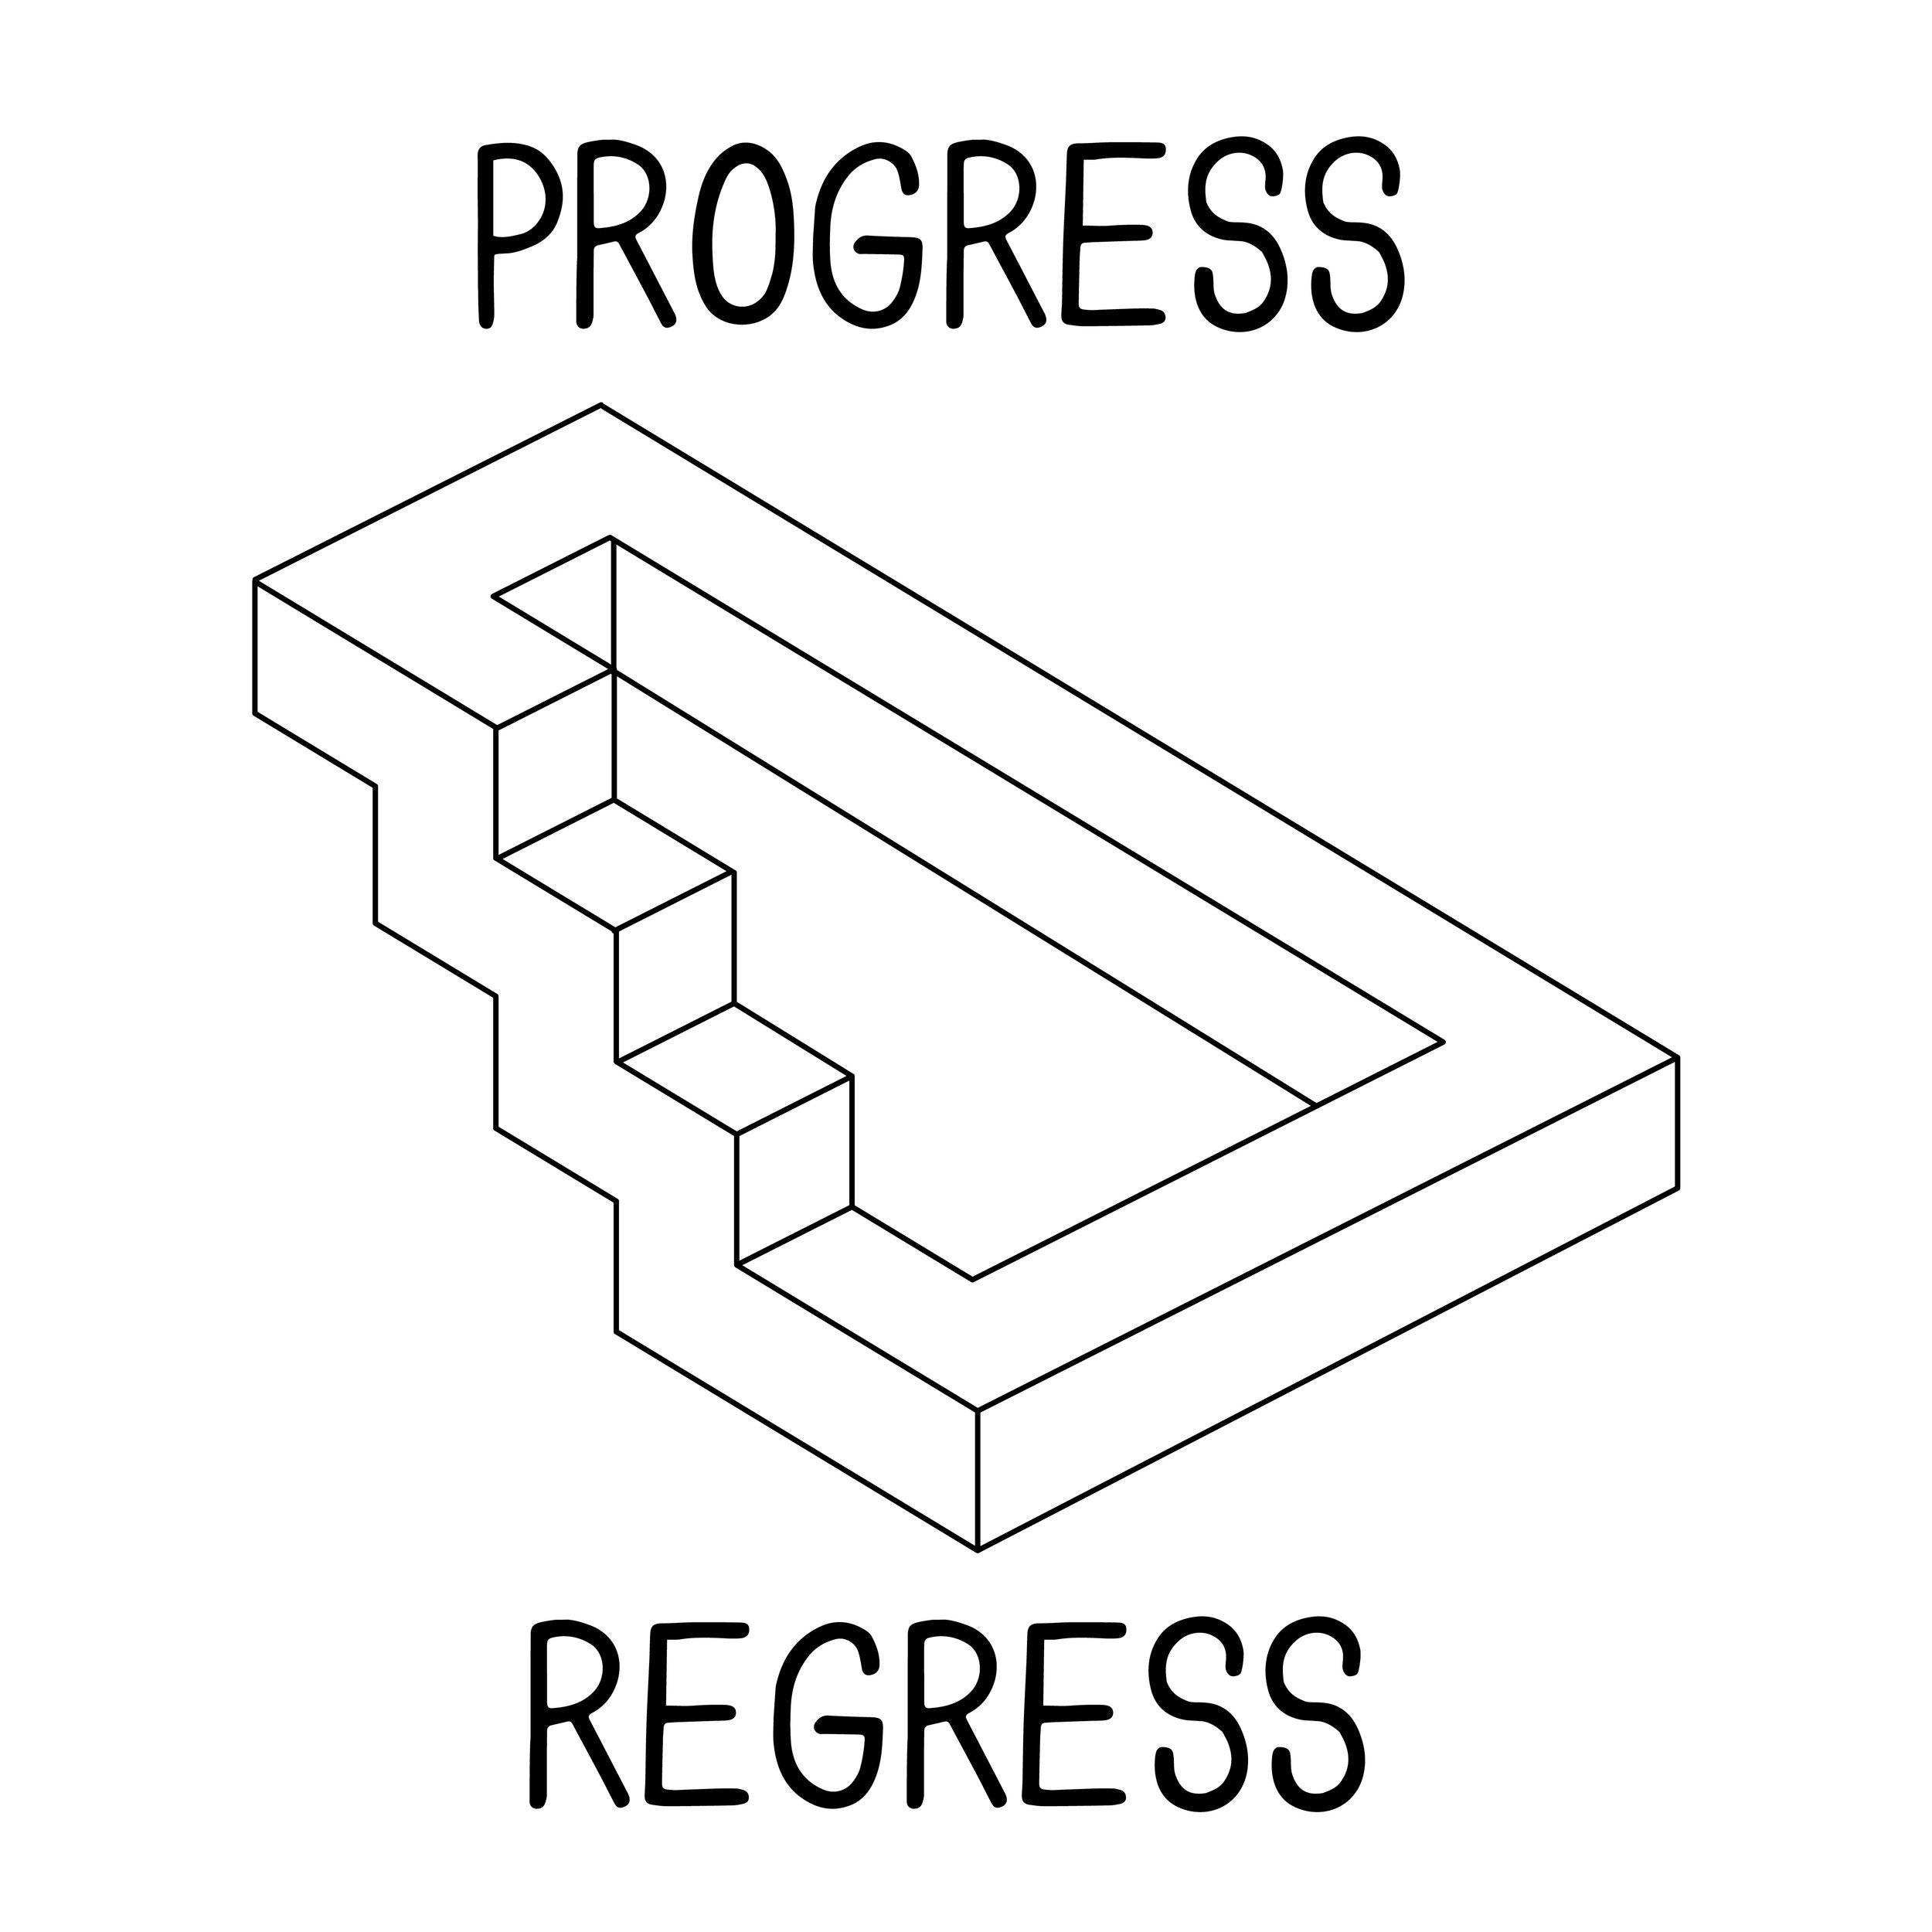 progressregress-01.jpg